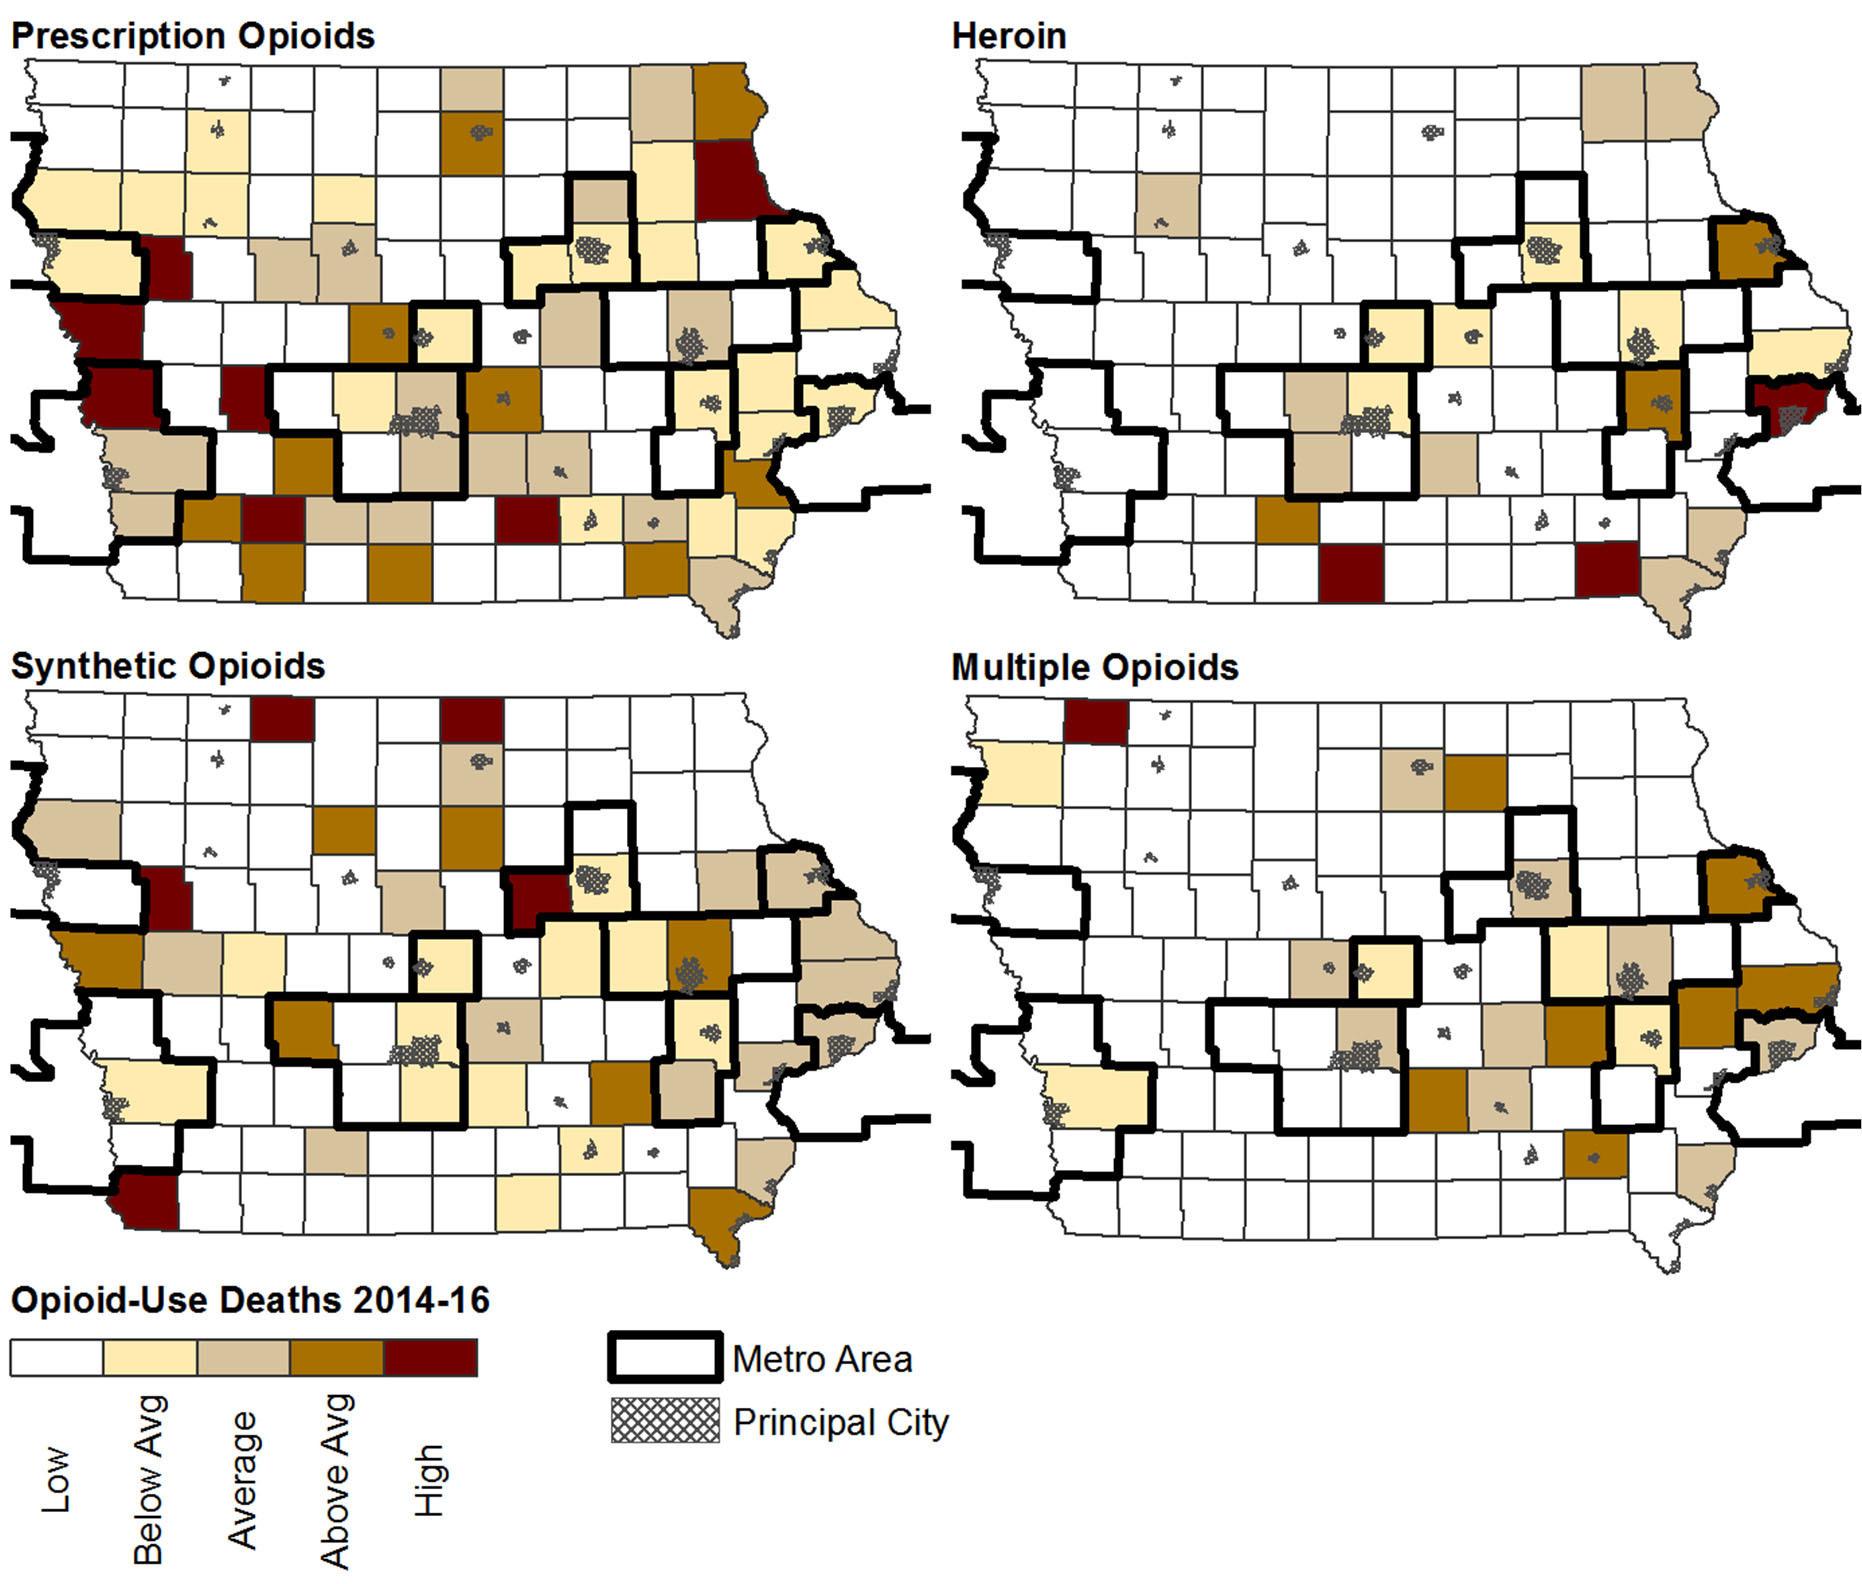 Prescription opioid overdose deaths falling in Iowa